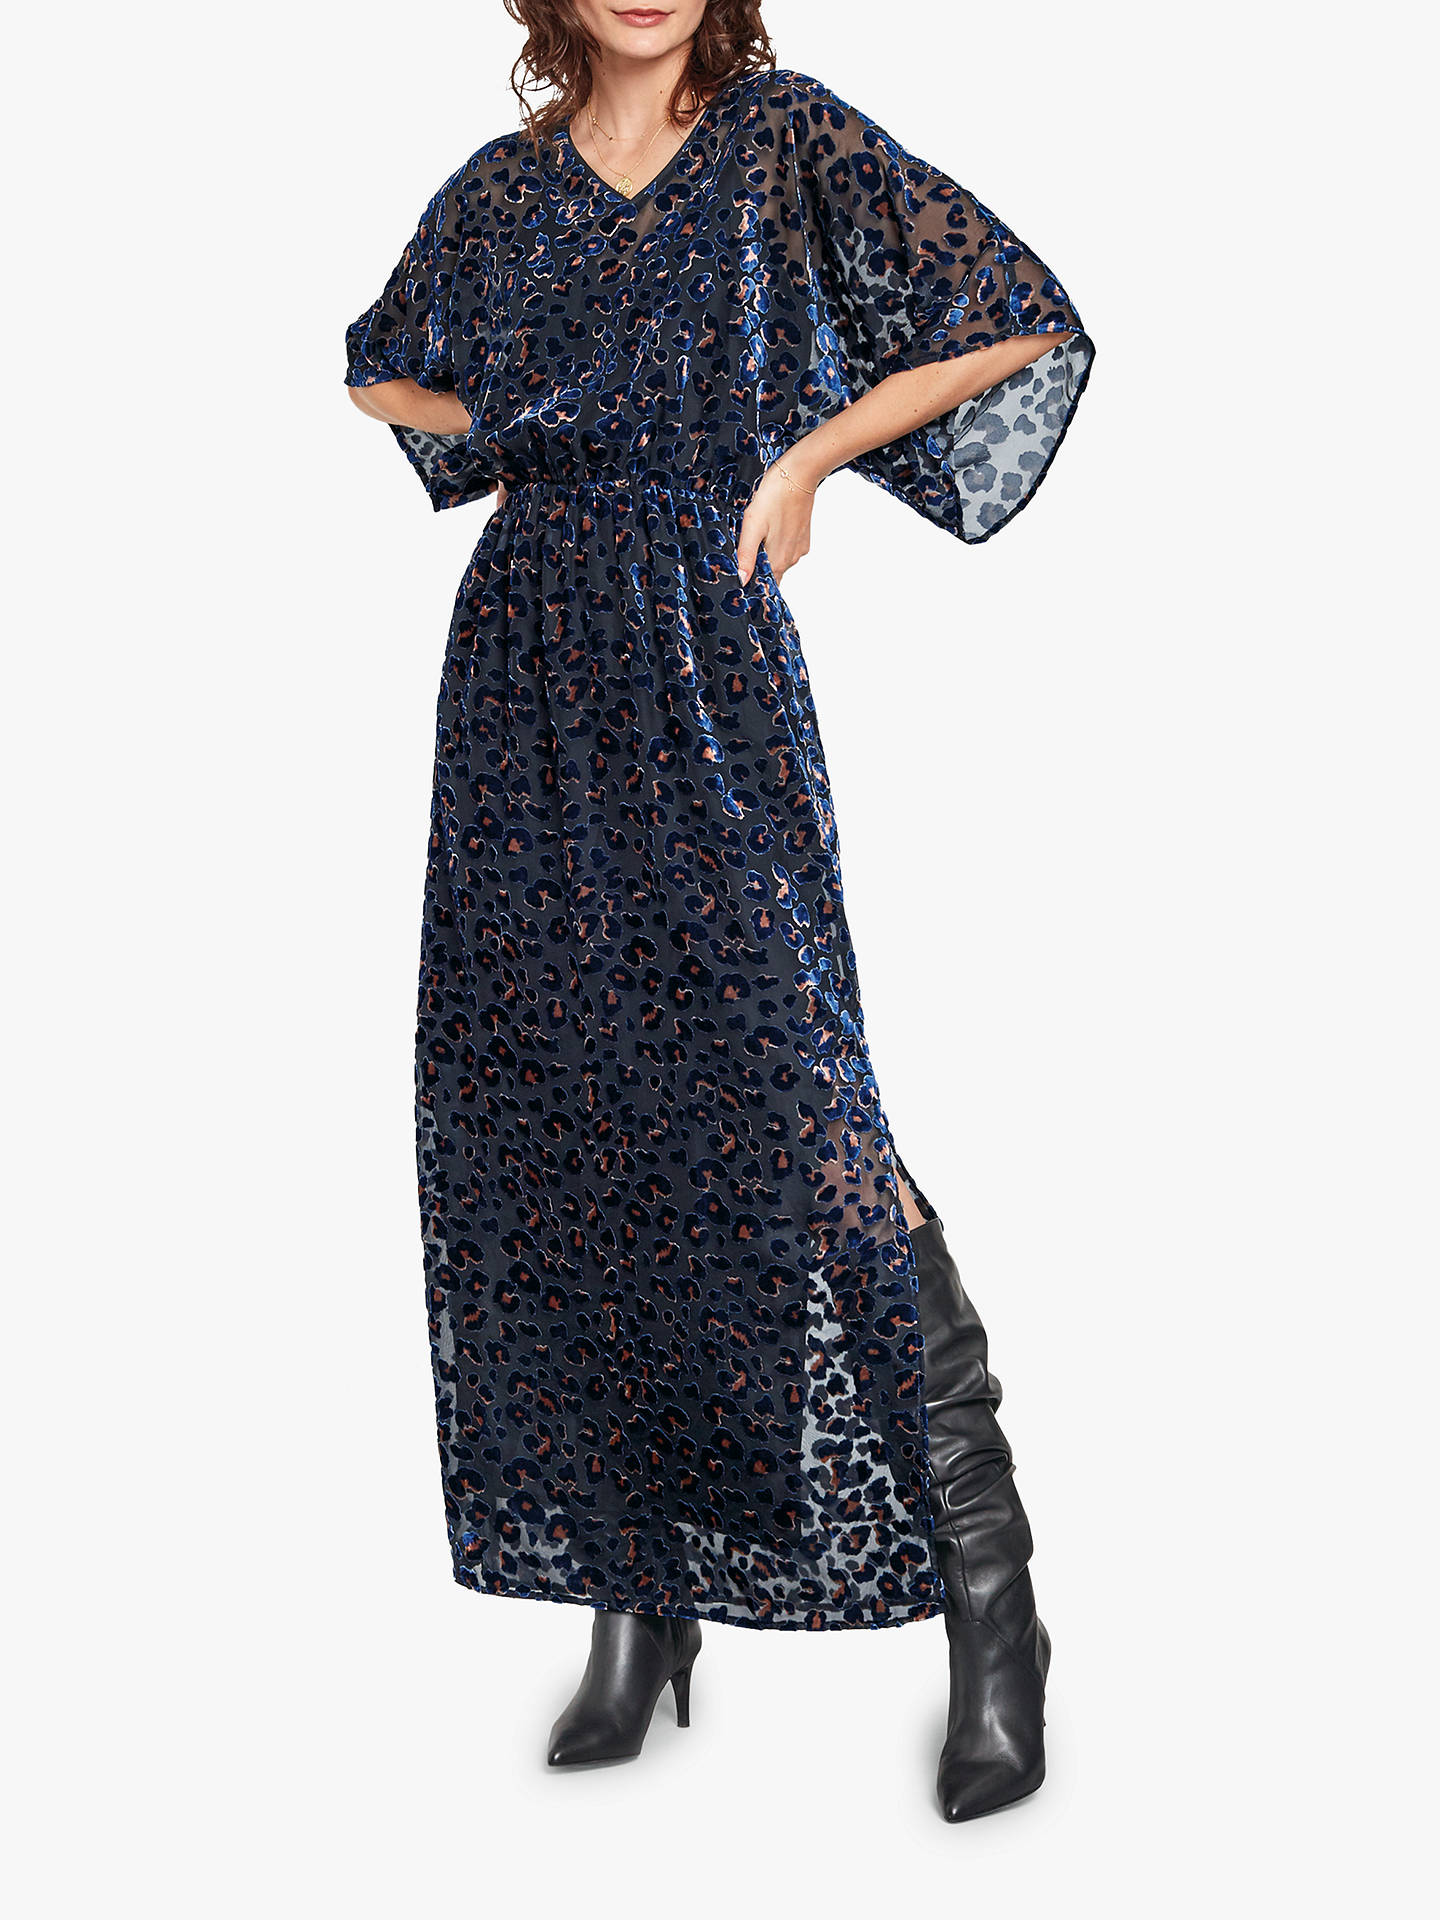 1669b62c1bb3 Buy hush Devore Leopard Print Kimono Dress, Black/Navy, 16 Online at  johnlewis ...